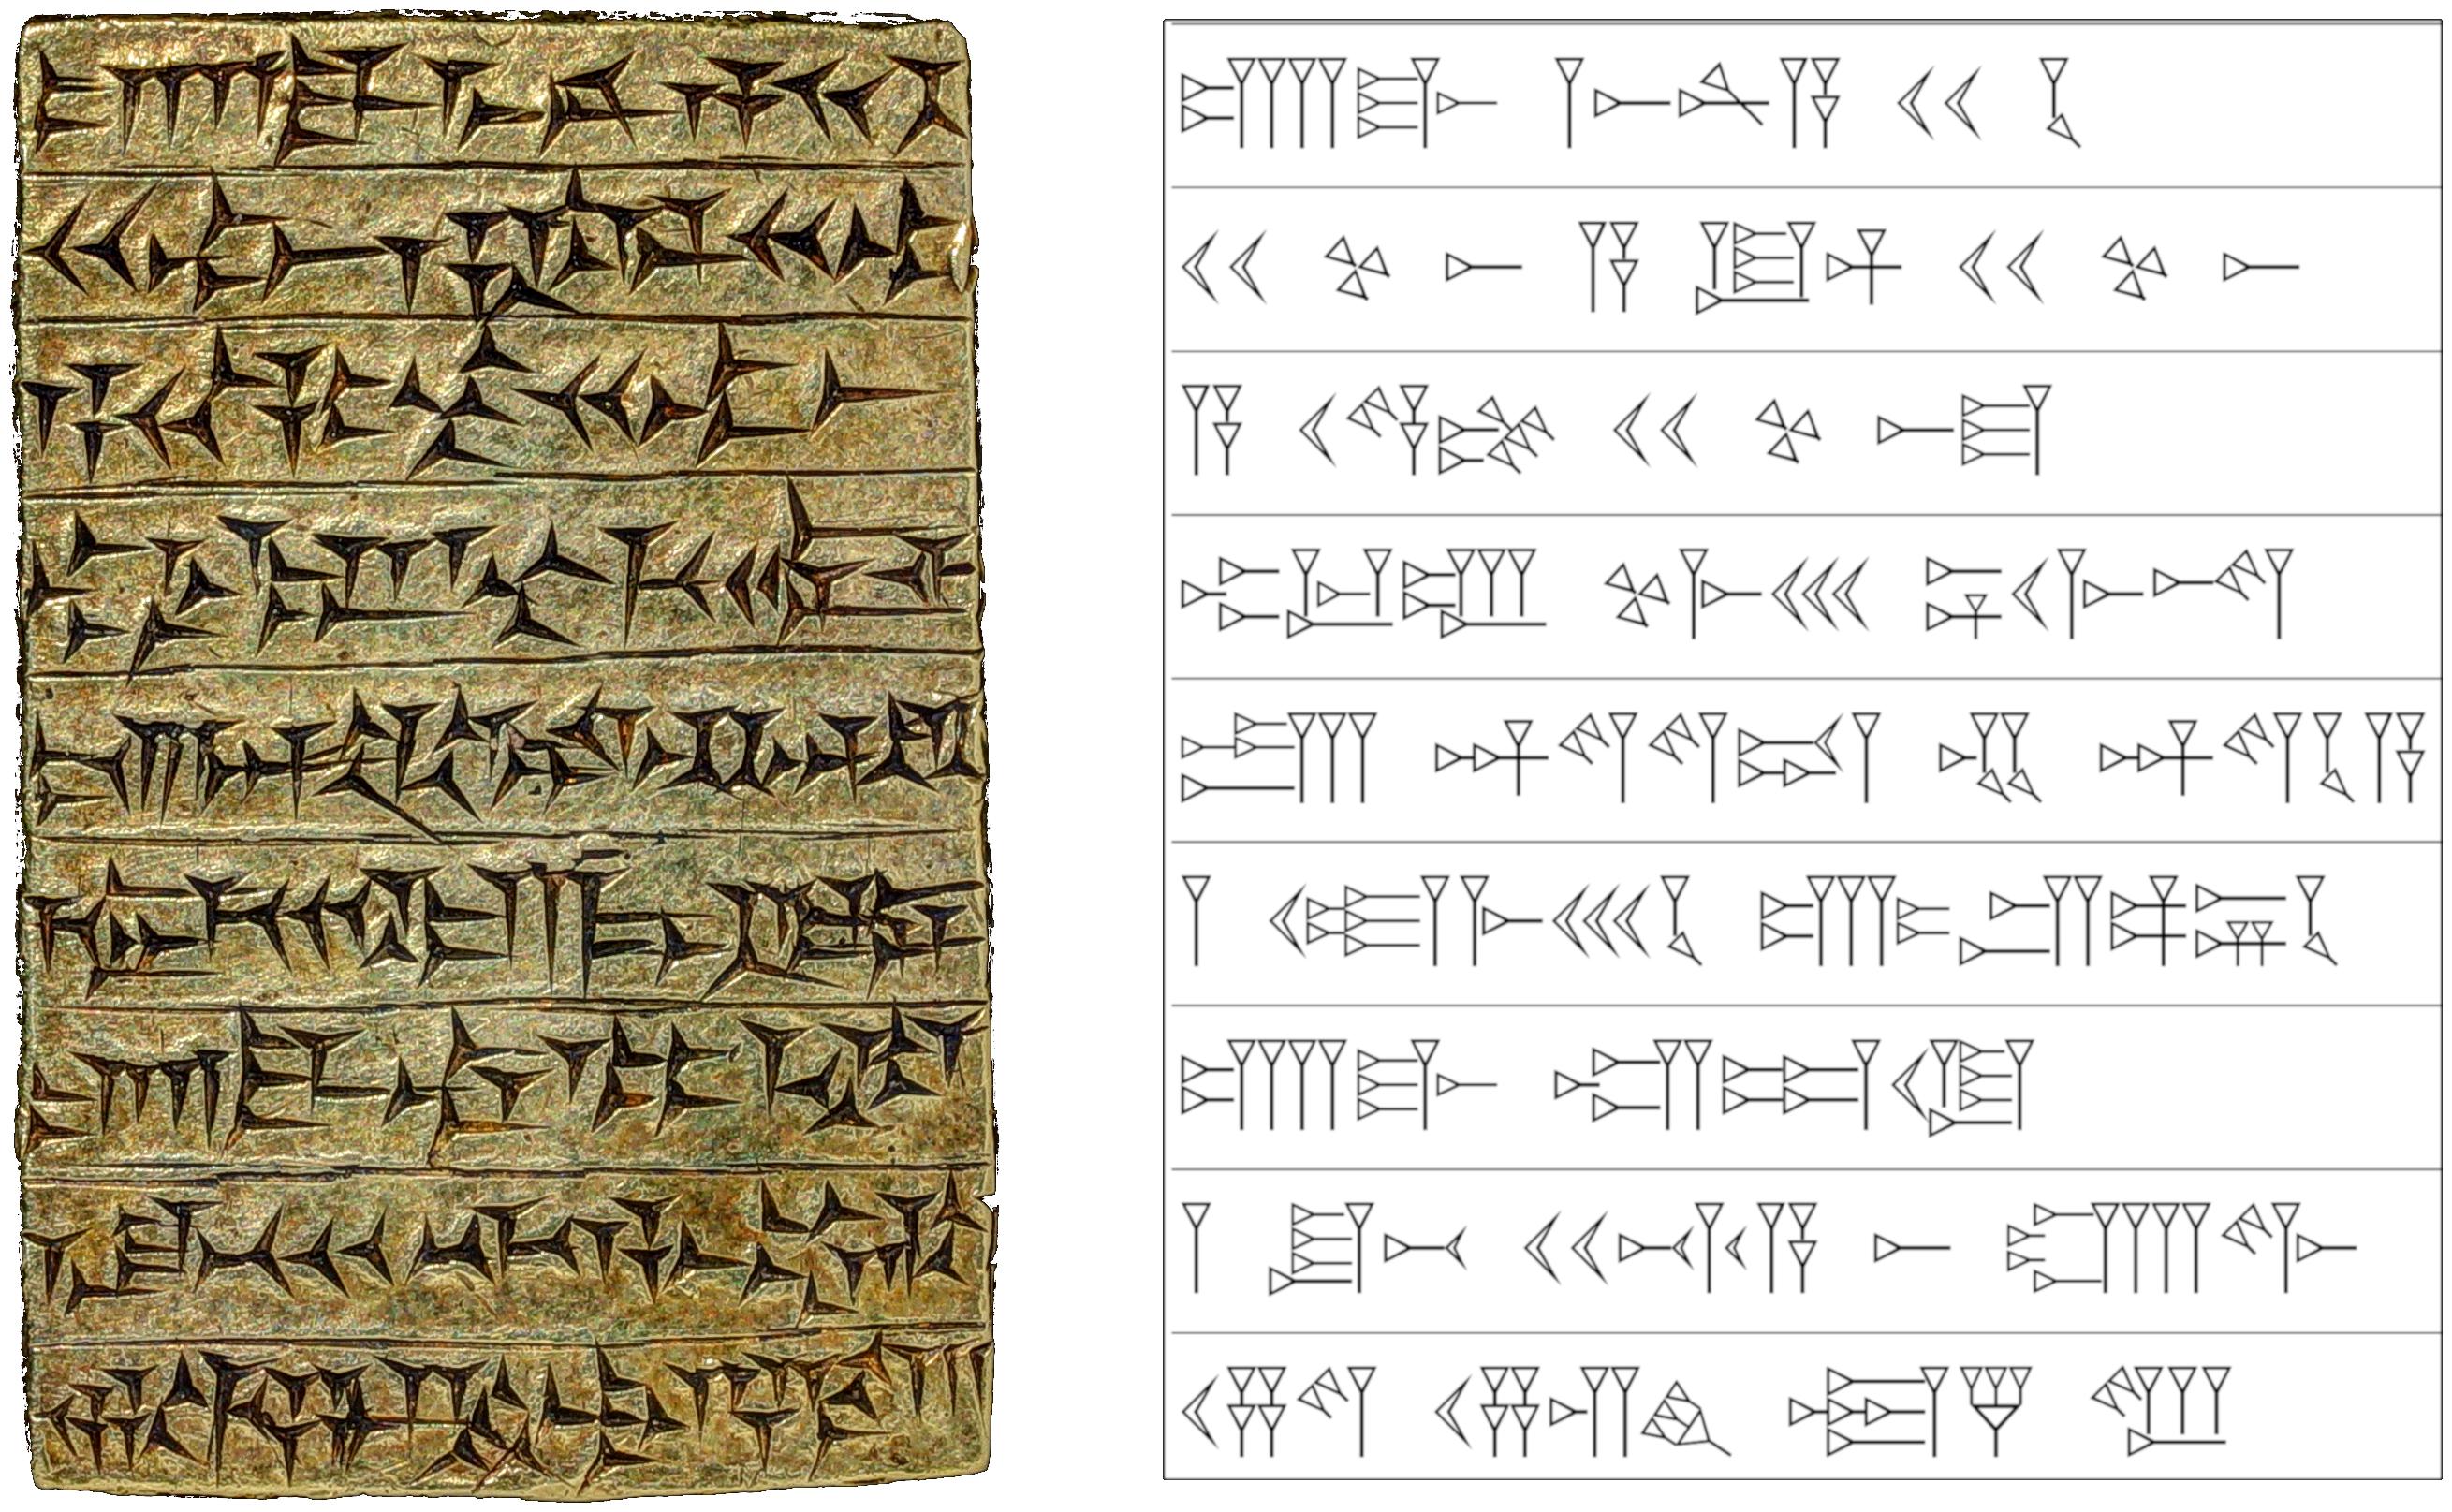 ashurnasirpal gold tablet